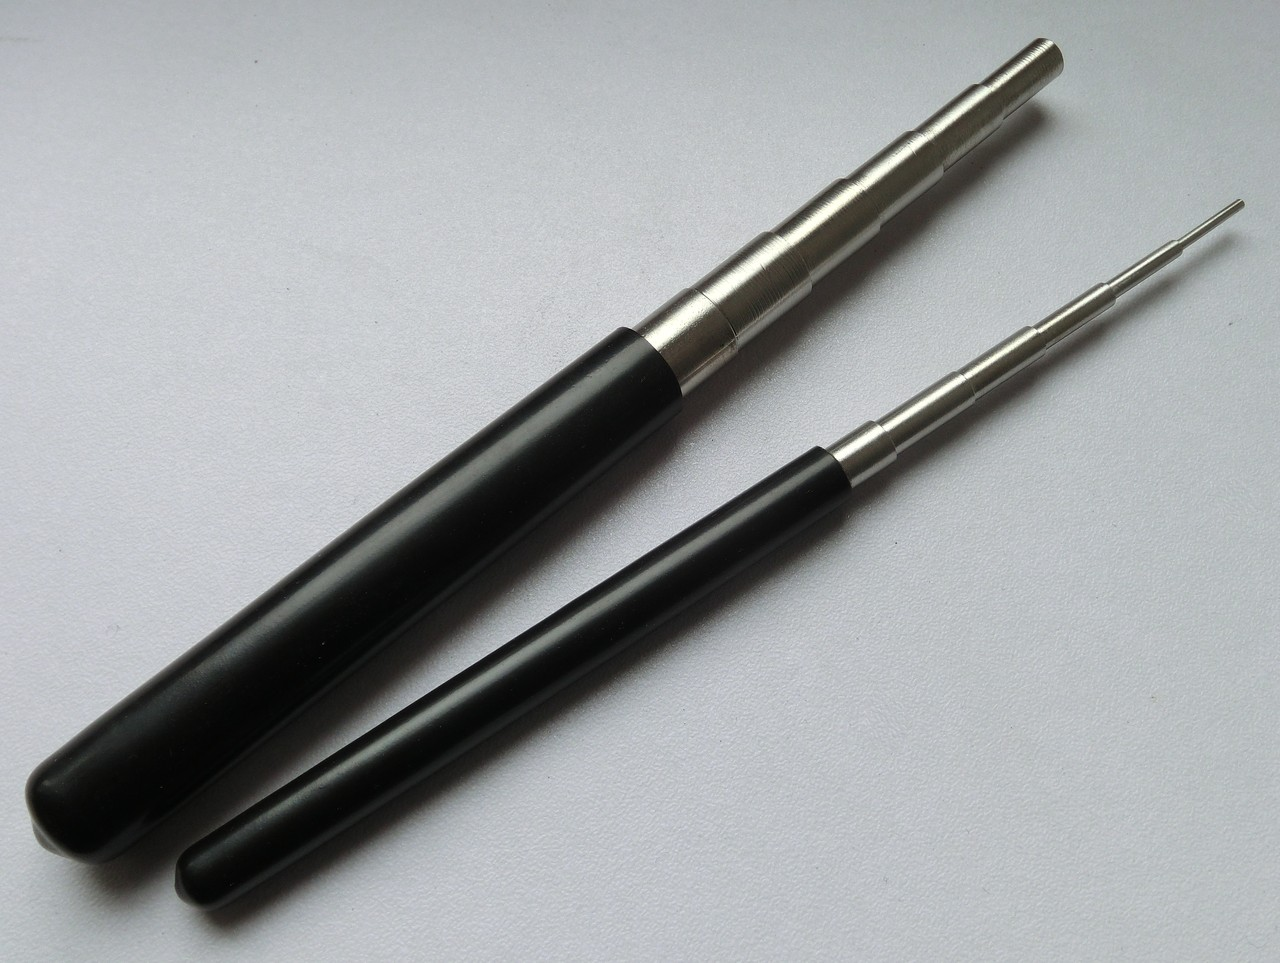 Mandrels - schmuckTools, Werkzeug für Goldschmiede, Silberschmiede ...